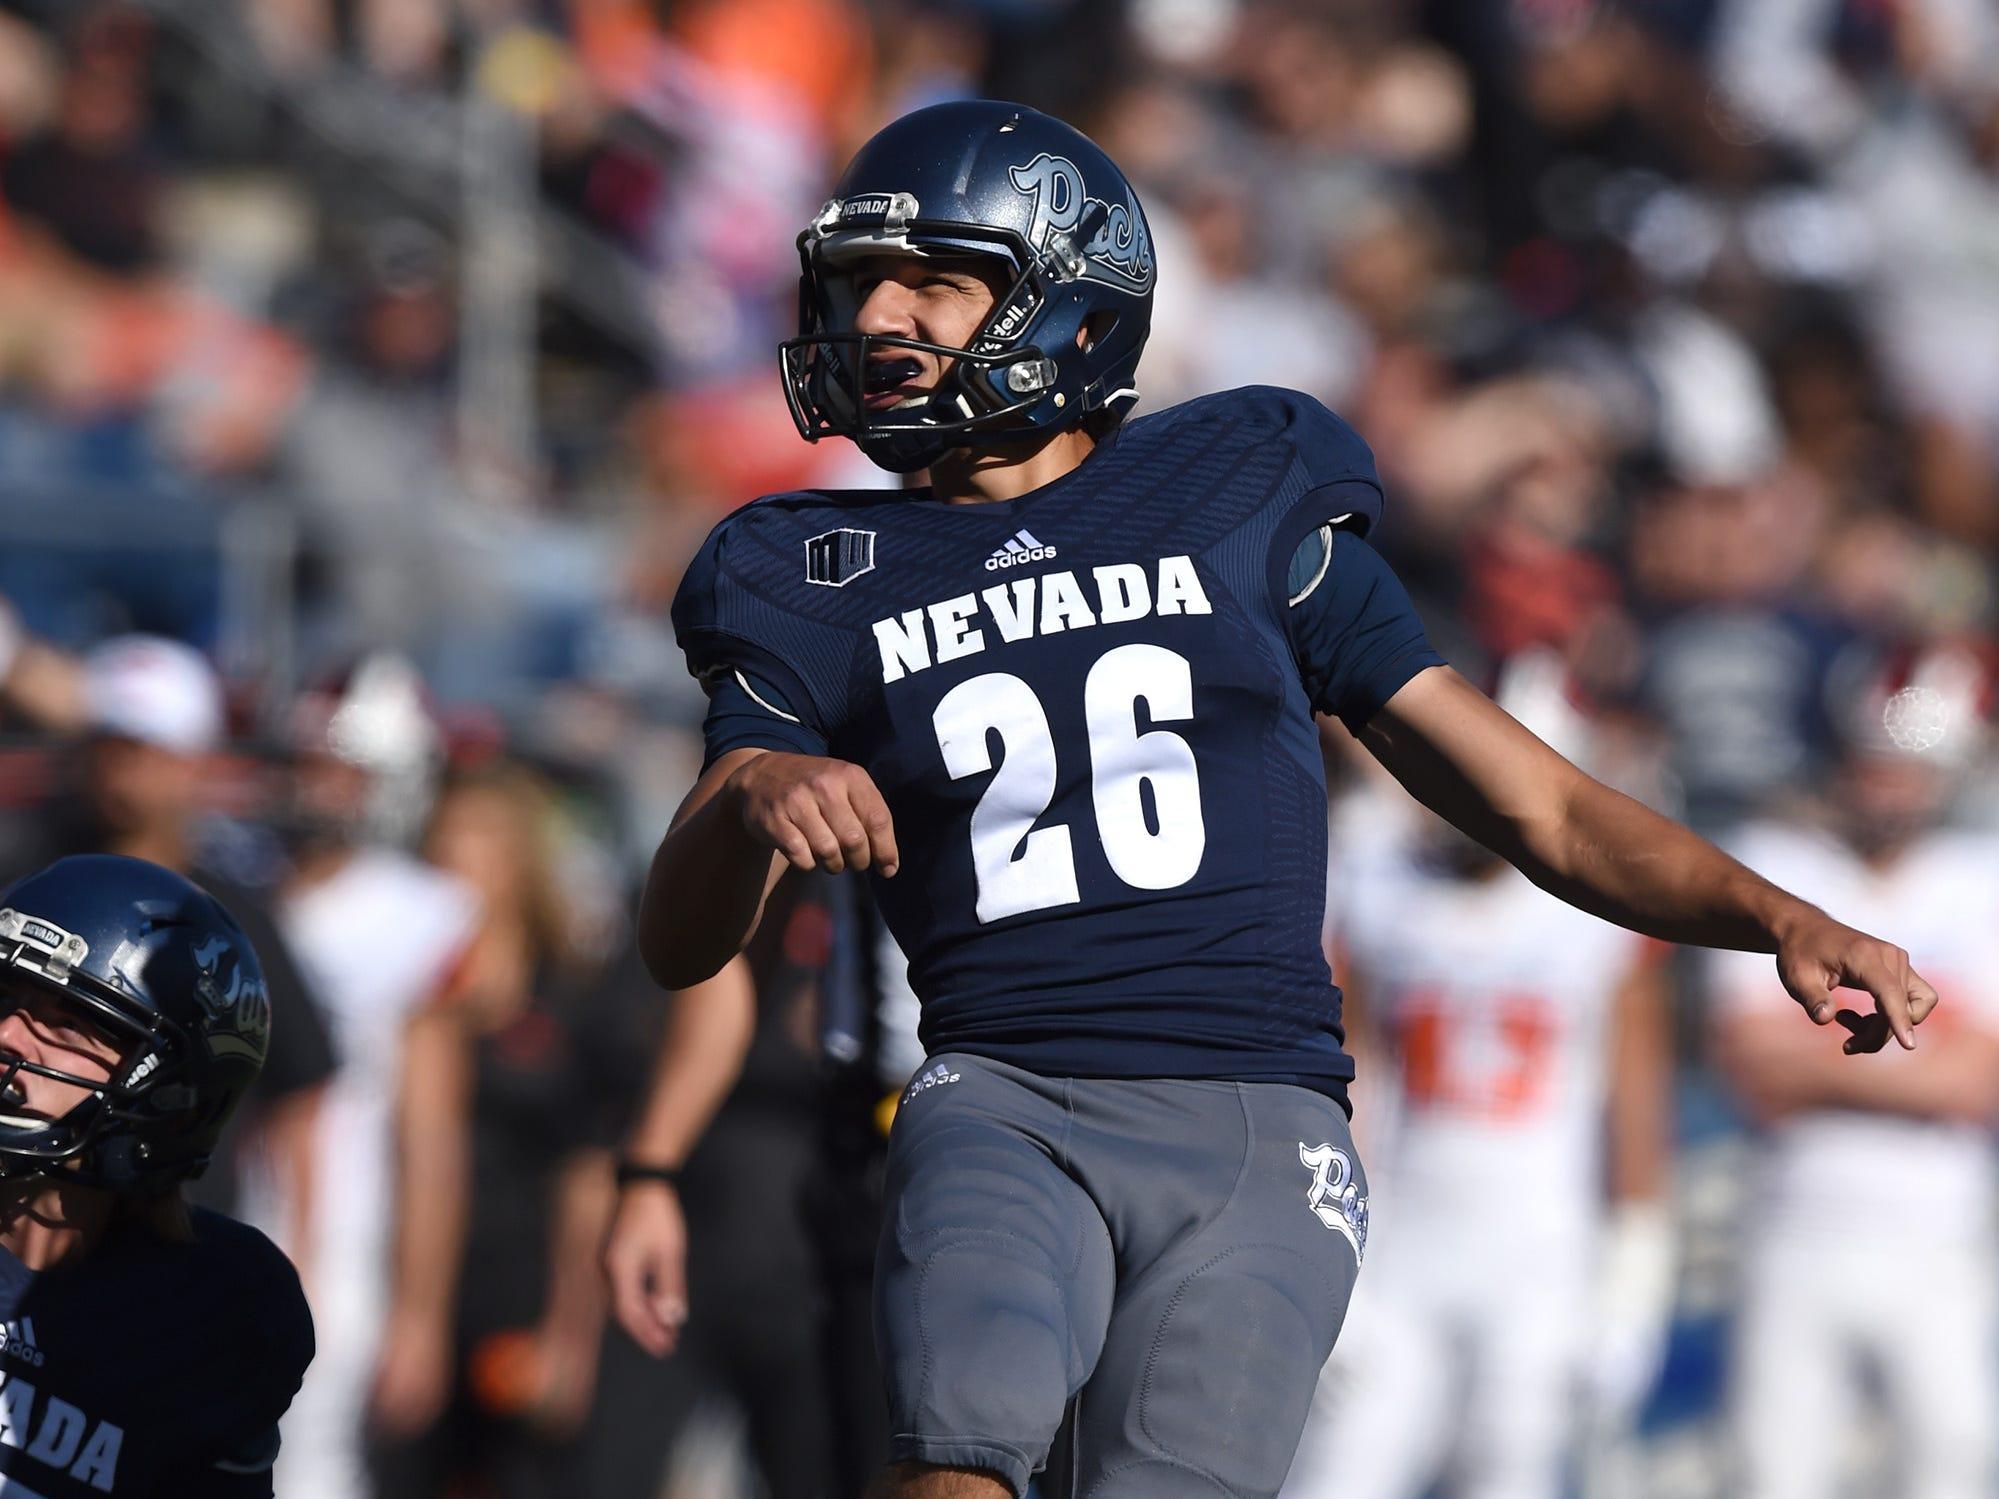 Nevada Ramiz Ahmed kick the ball against Oregon State at Mackay Stadium on Sept. 15, 2018.